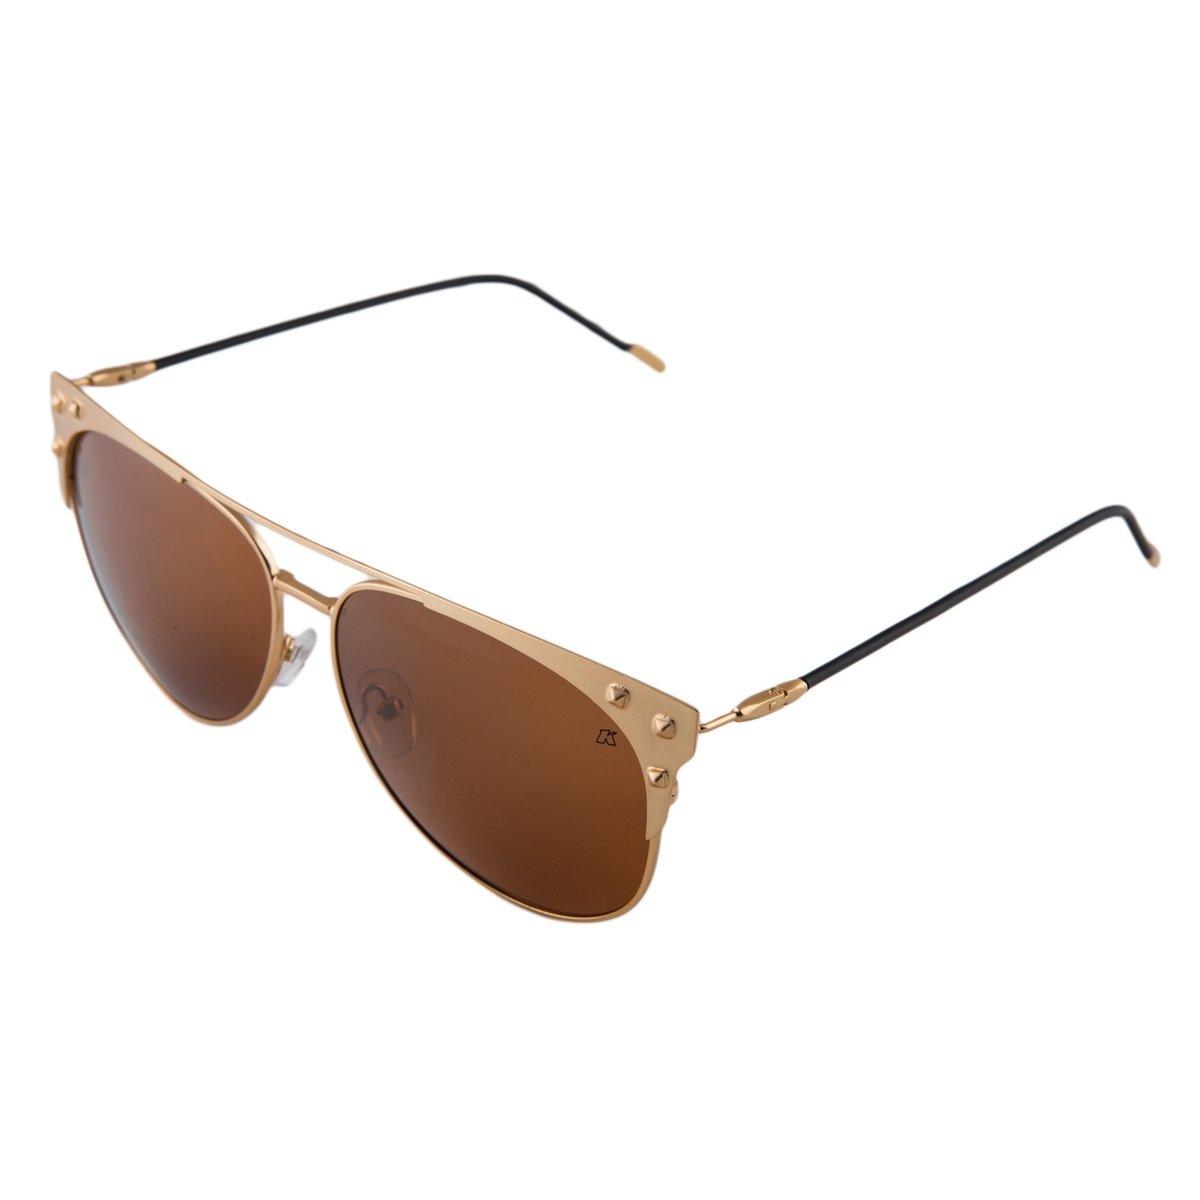 4dda65a4620a9 Óculos de Sol Khatto KT15153 - Compre Agora   Zattini